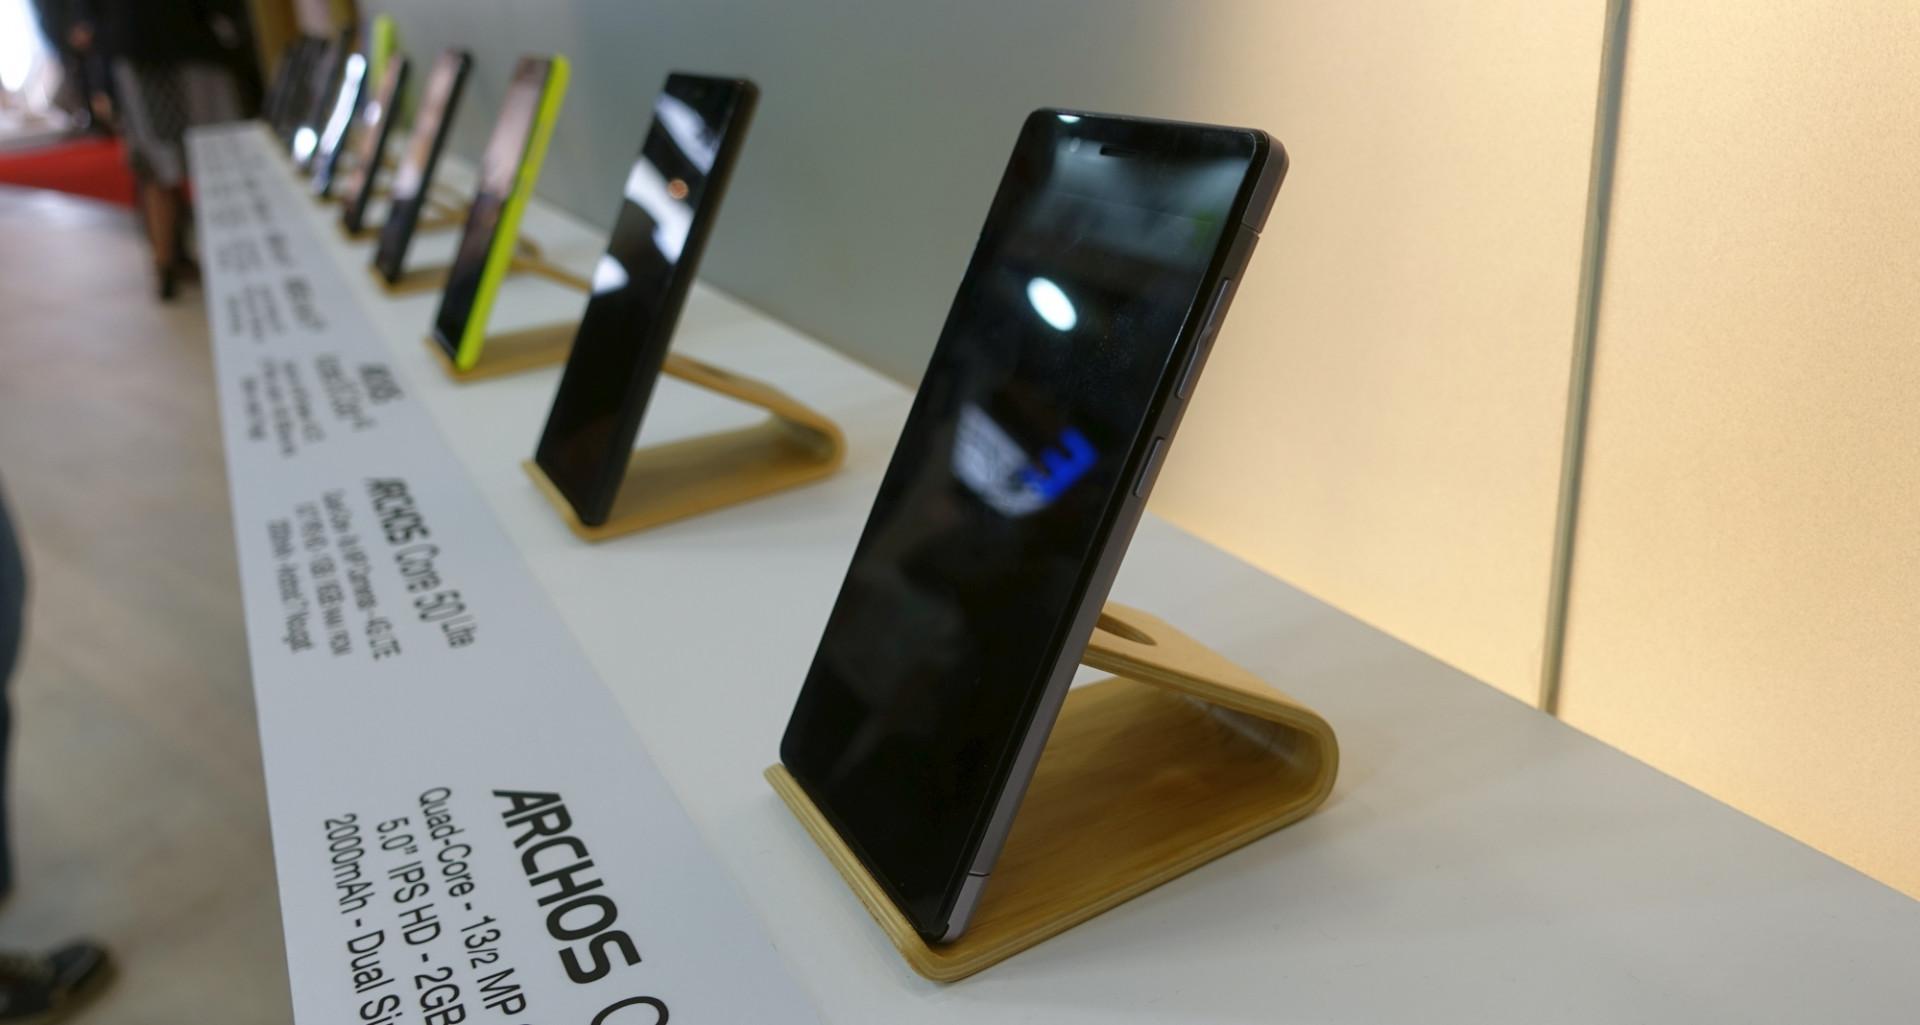 billige smartphones ab 70 euro von archos heise online. Black Bedroom Furniture Sets. Home Design Ideas